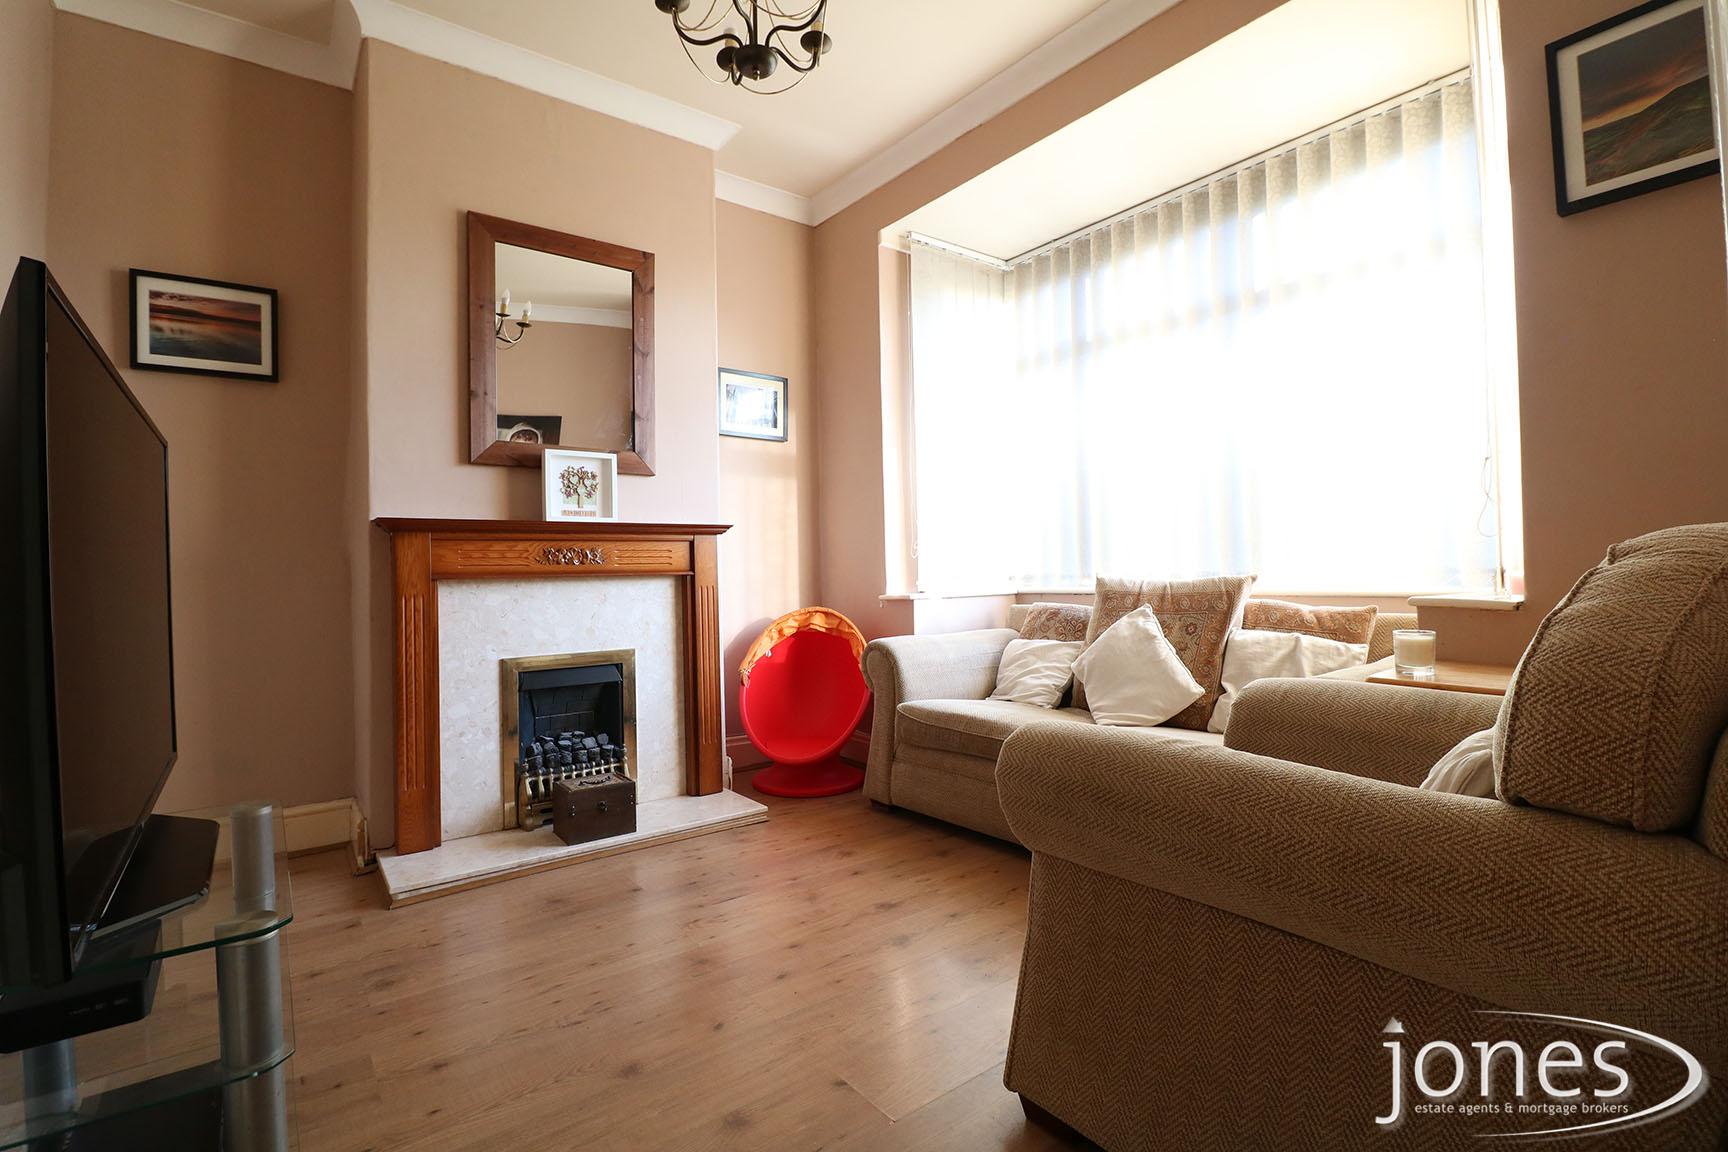 Home for Sale Let - Photo 02 North Mount Pleasant Street, Norton, Stockton on Tees, TS20 2JA